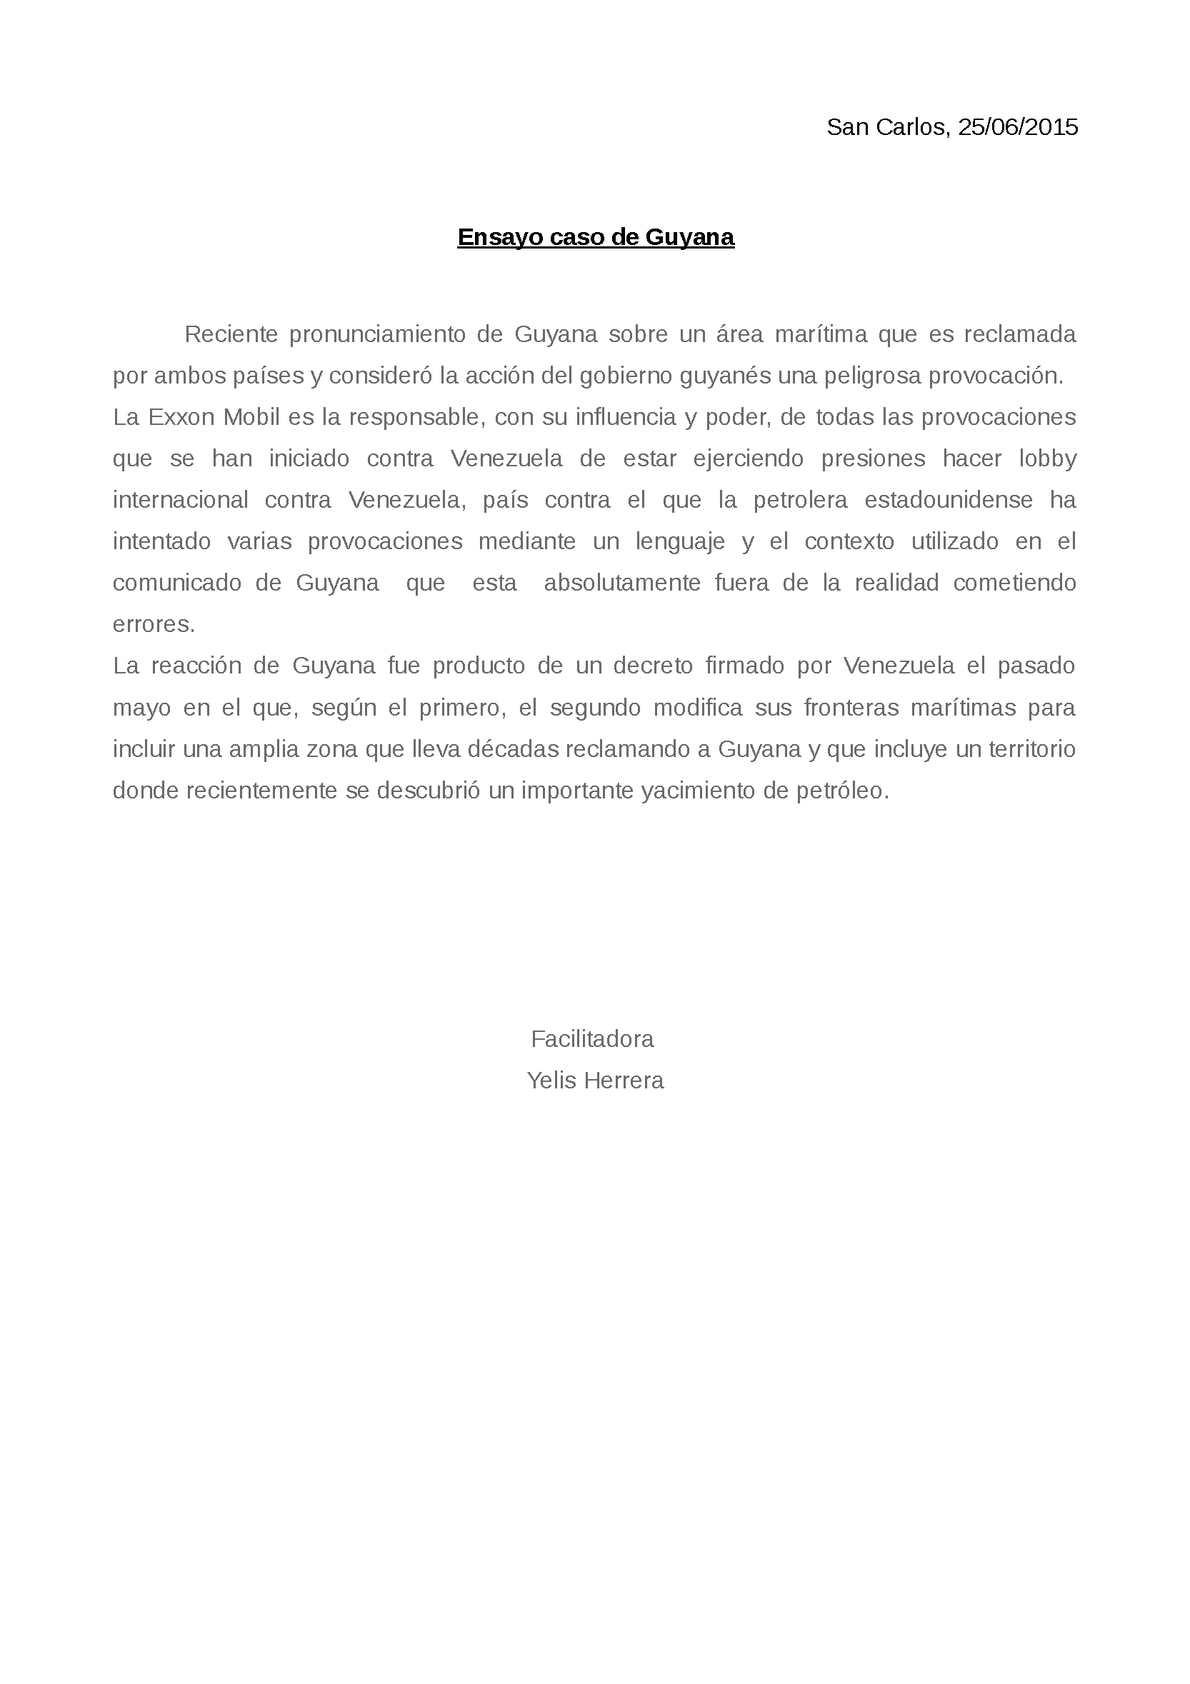 Ensayo de Guayana